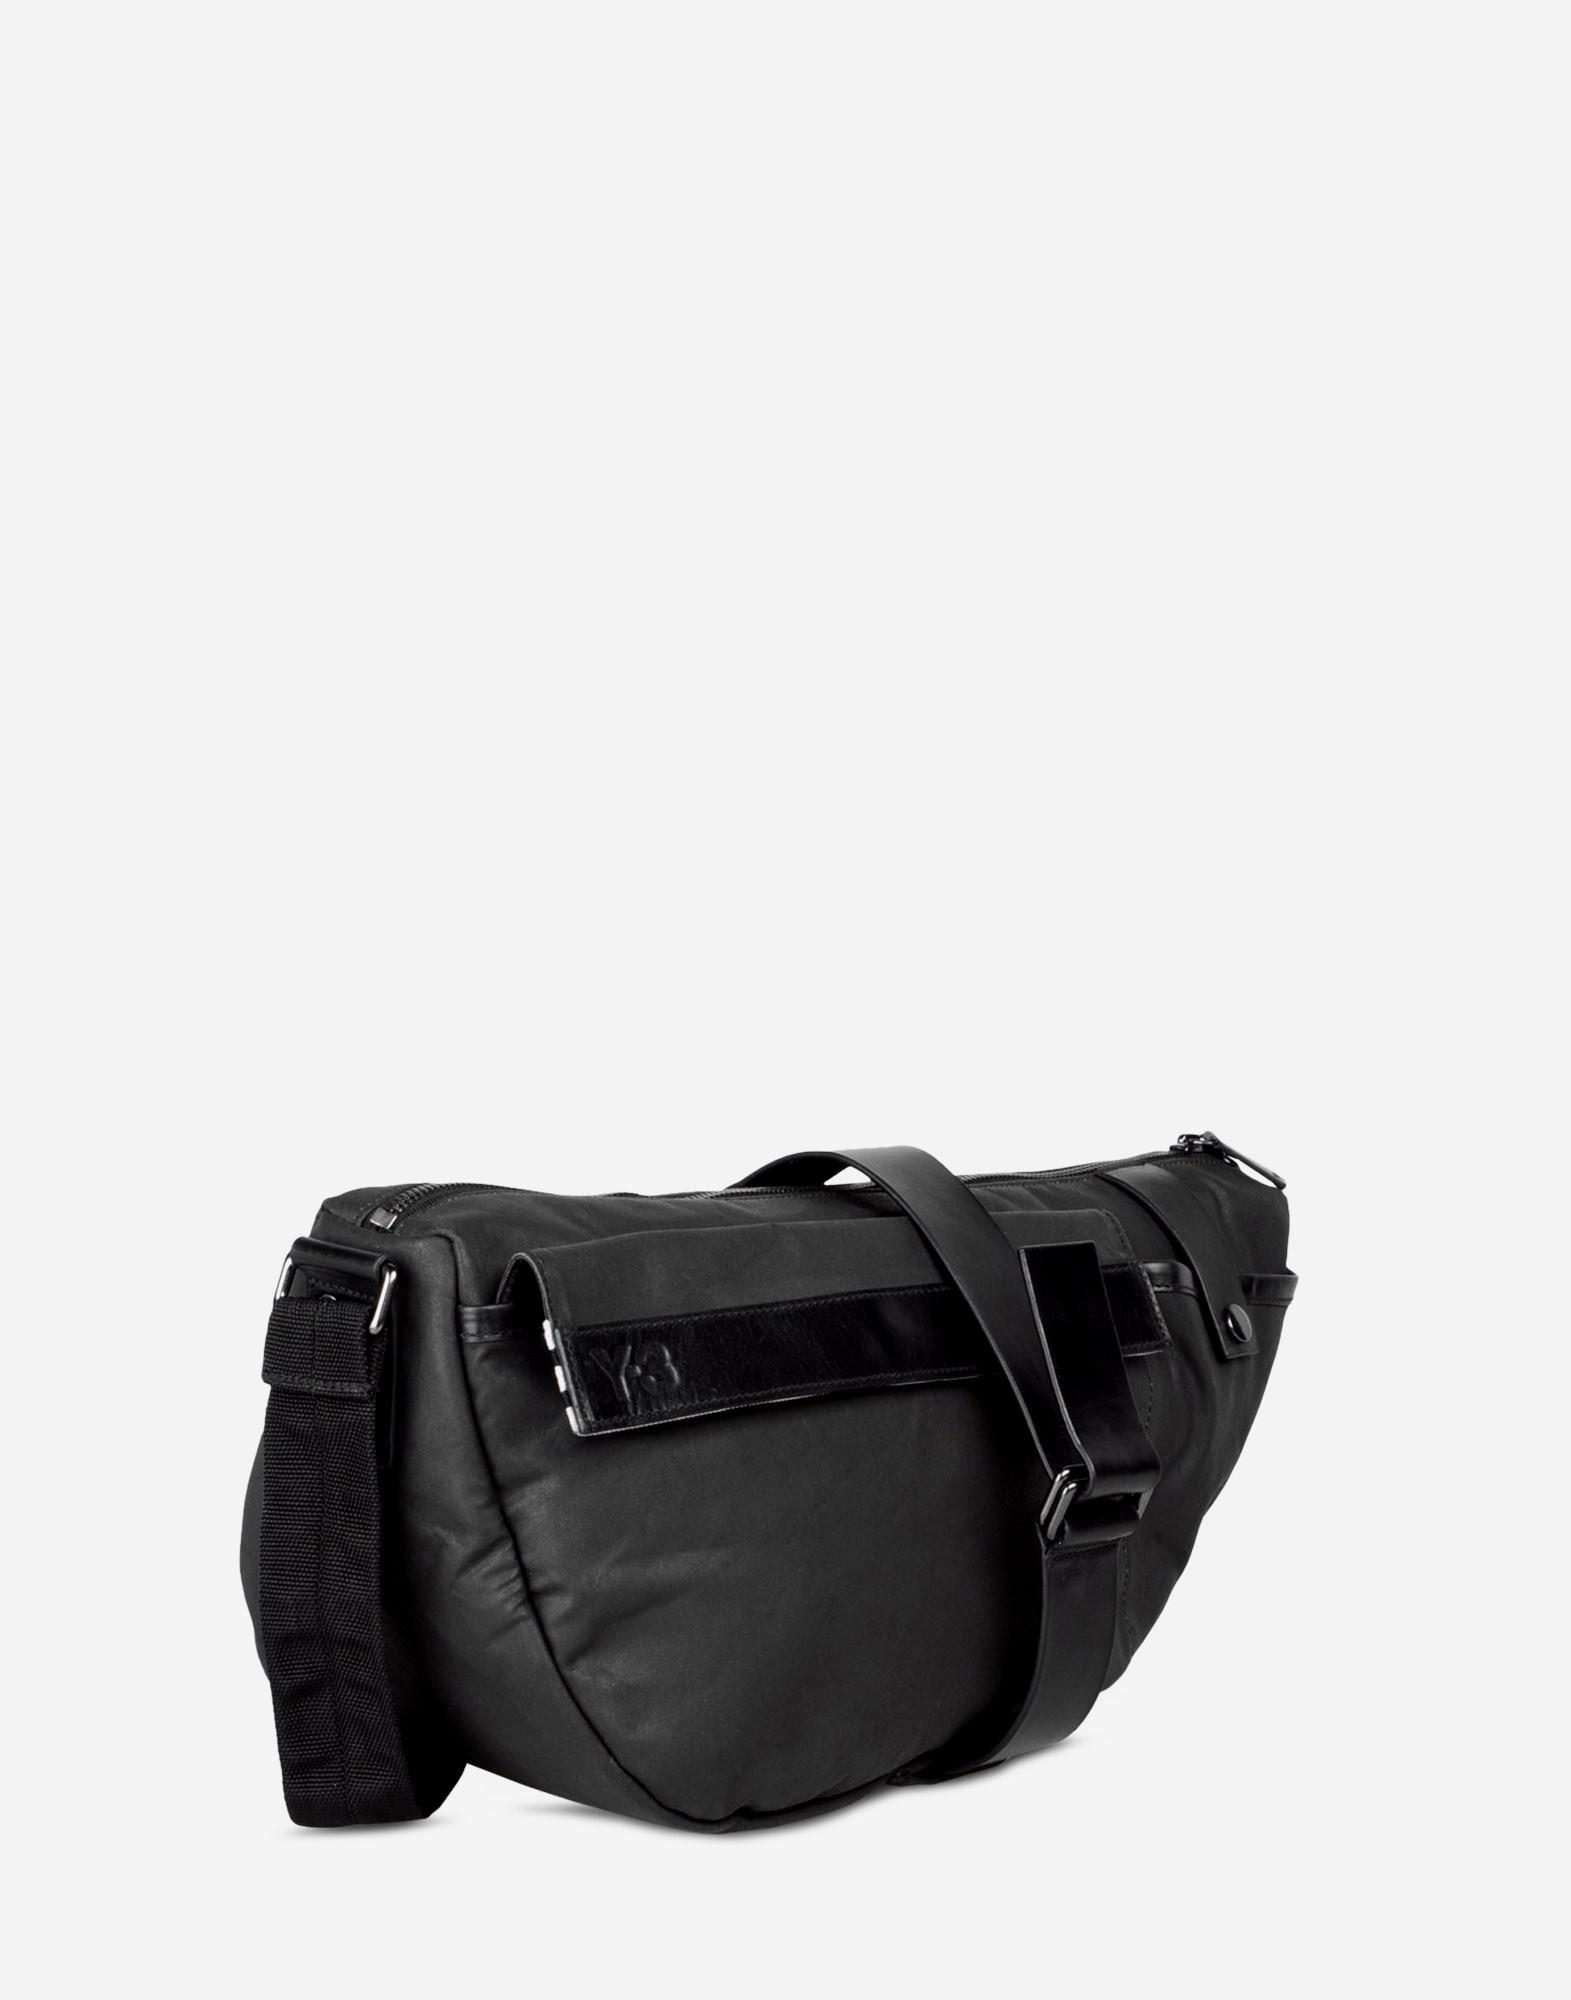 adidas sling bag for men